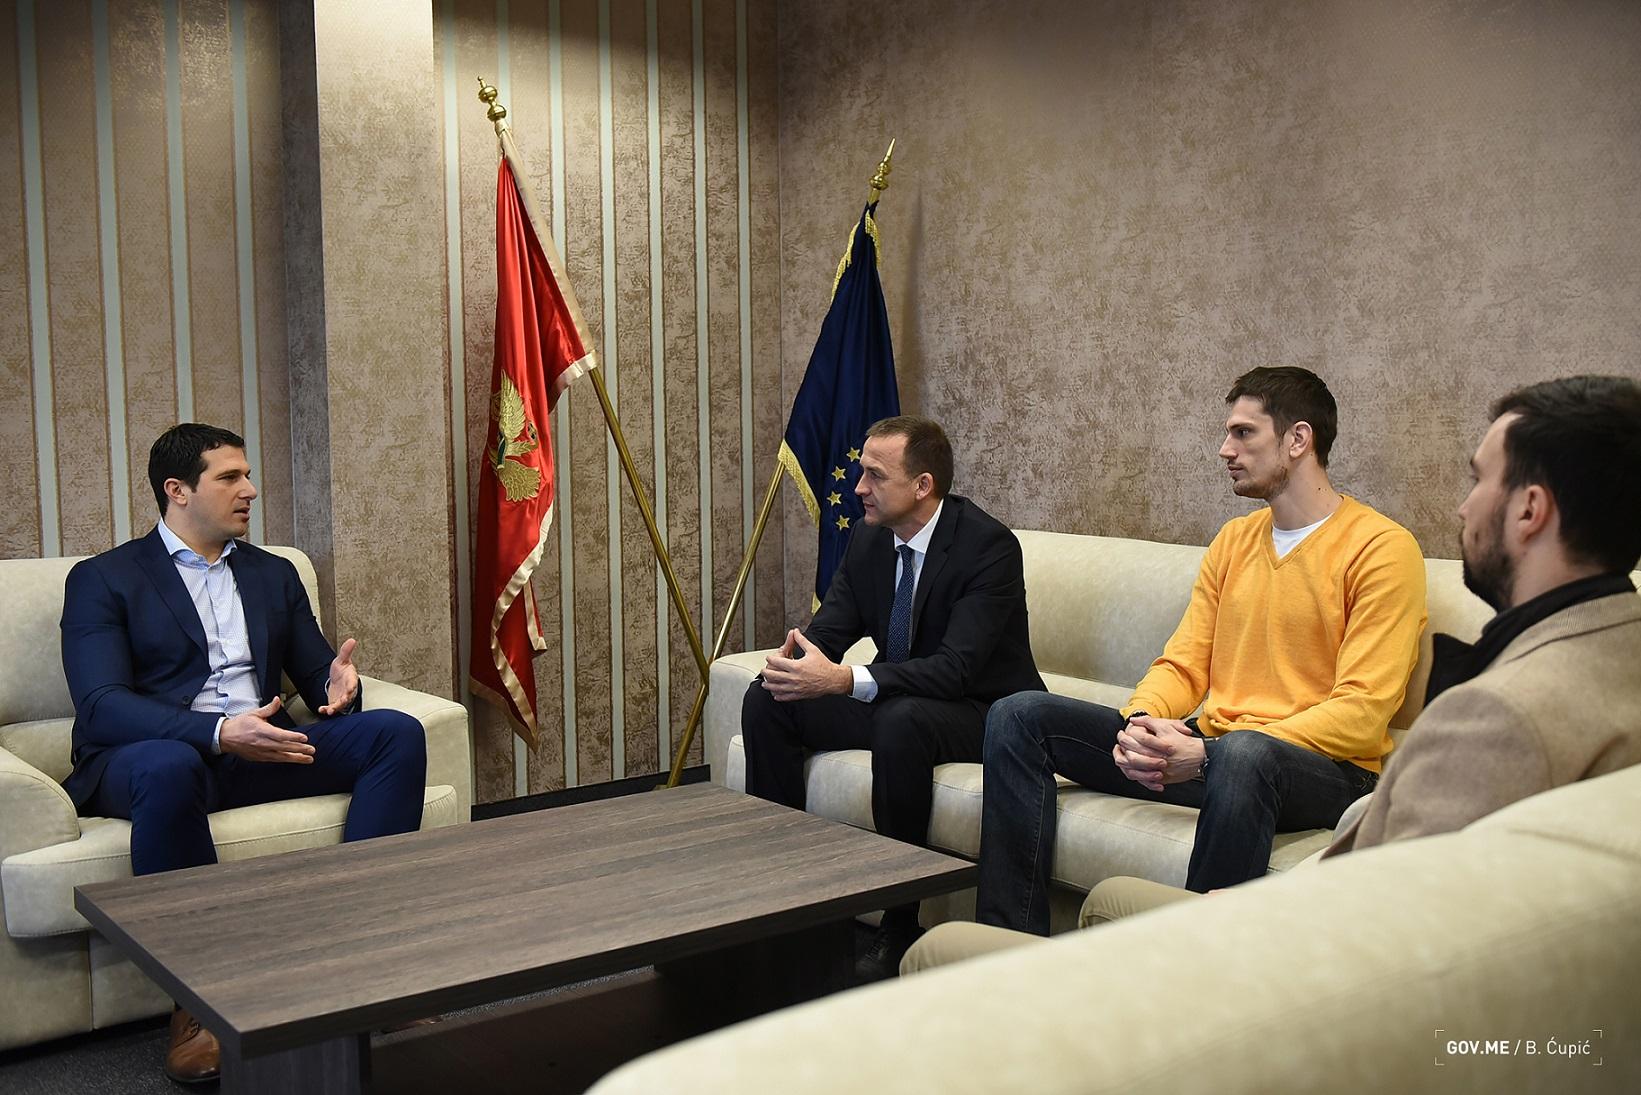 2019 01 18 Ministarstvo sporta prijem odbojkaske reprezenacije 006 cvetko pajkovic nikola janovic milos culafic